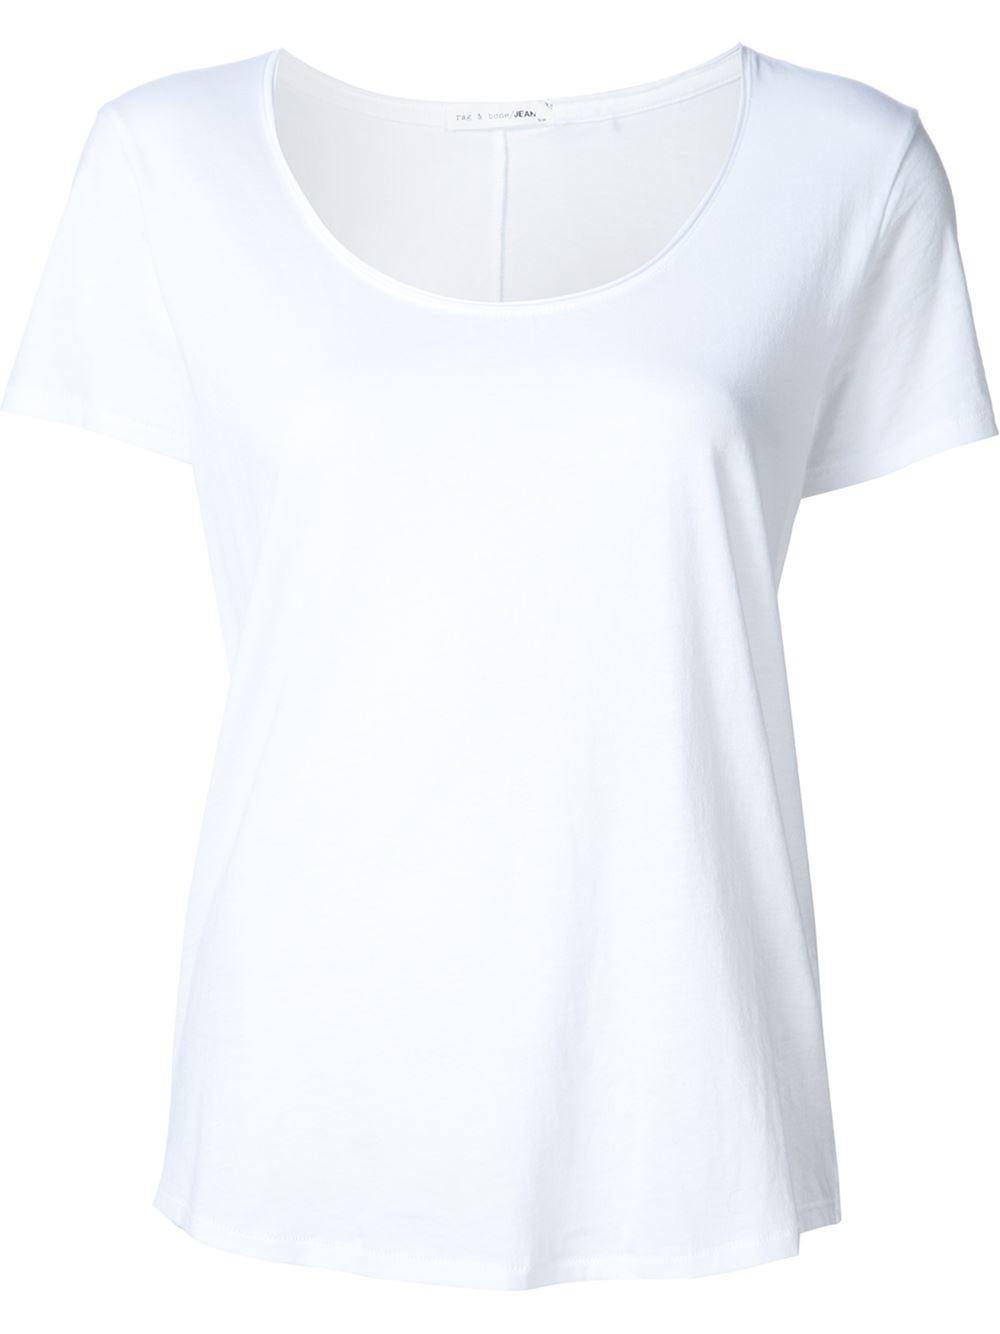 Rag bone slack shortsleeved t shirt in white save 29 for Rag and bone white t shirt